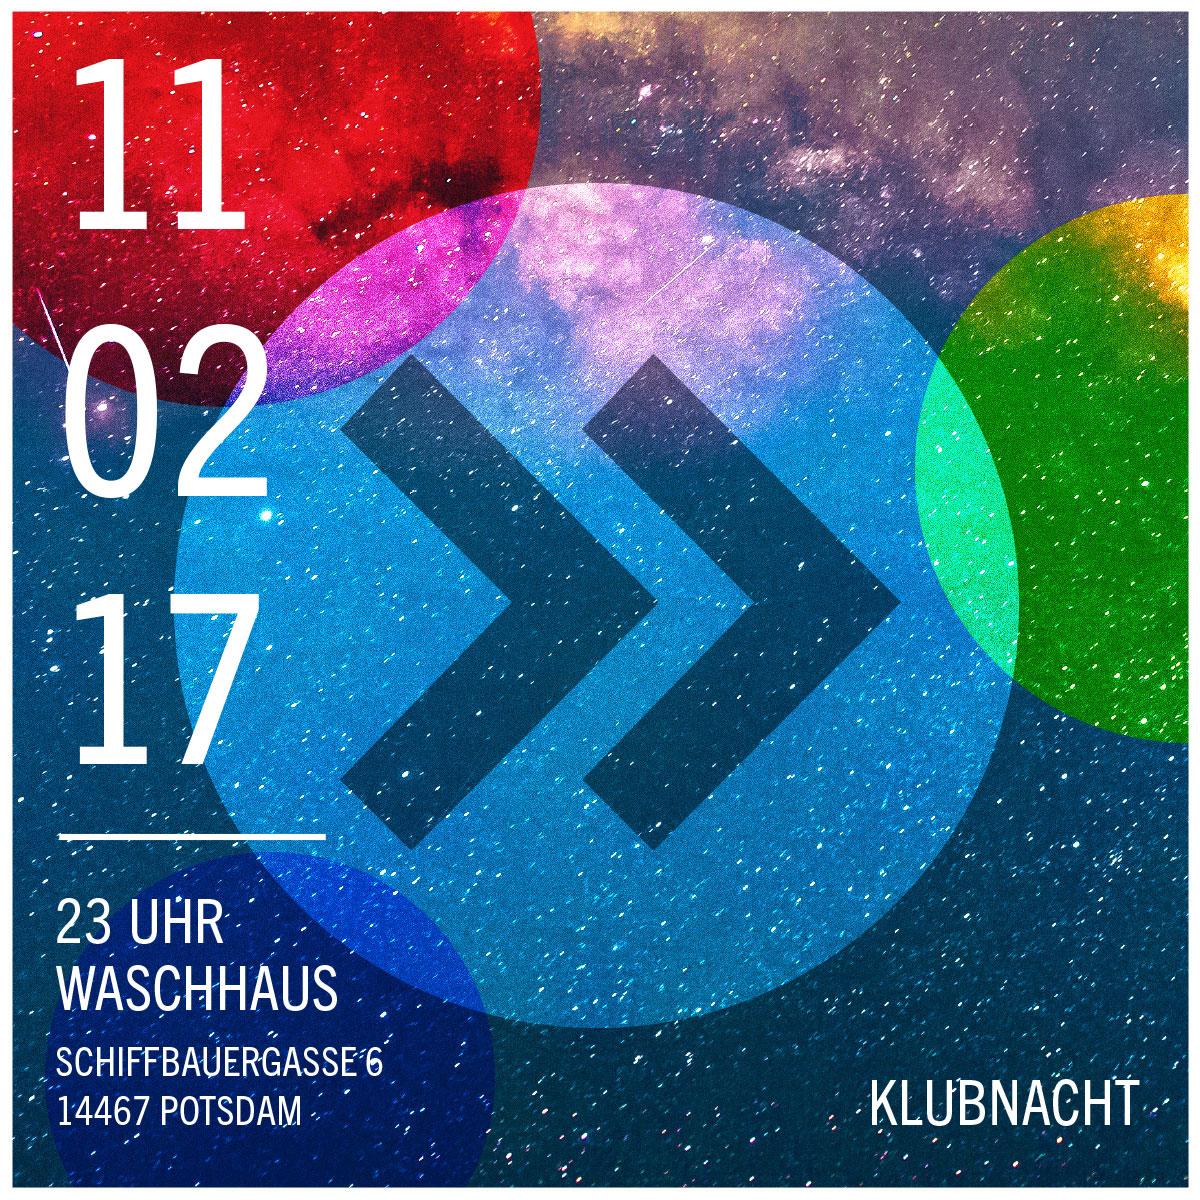 hakke_klubnacht11_fbprofil_2